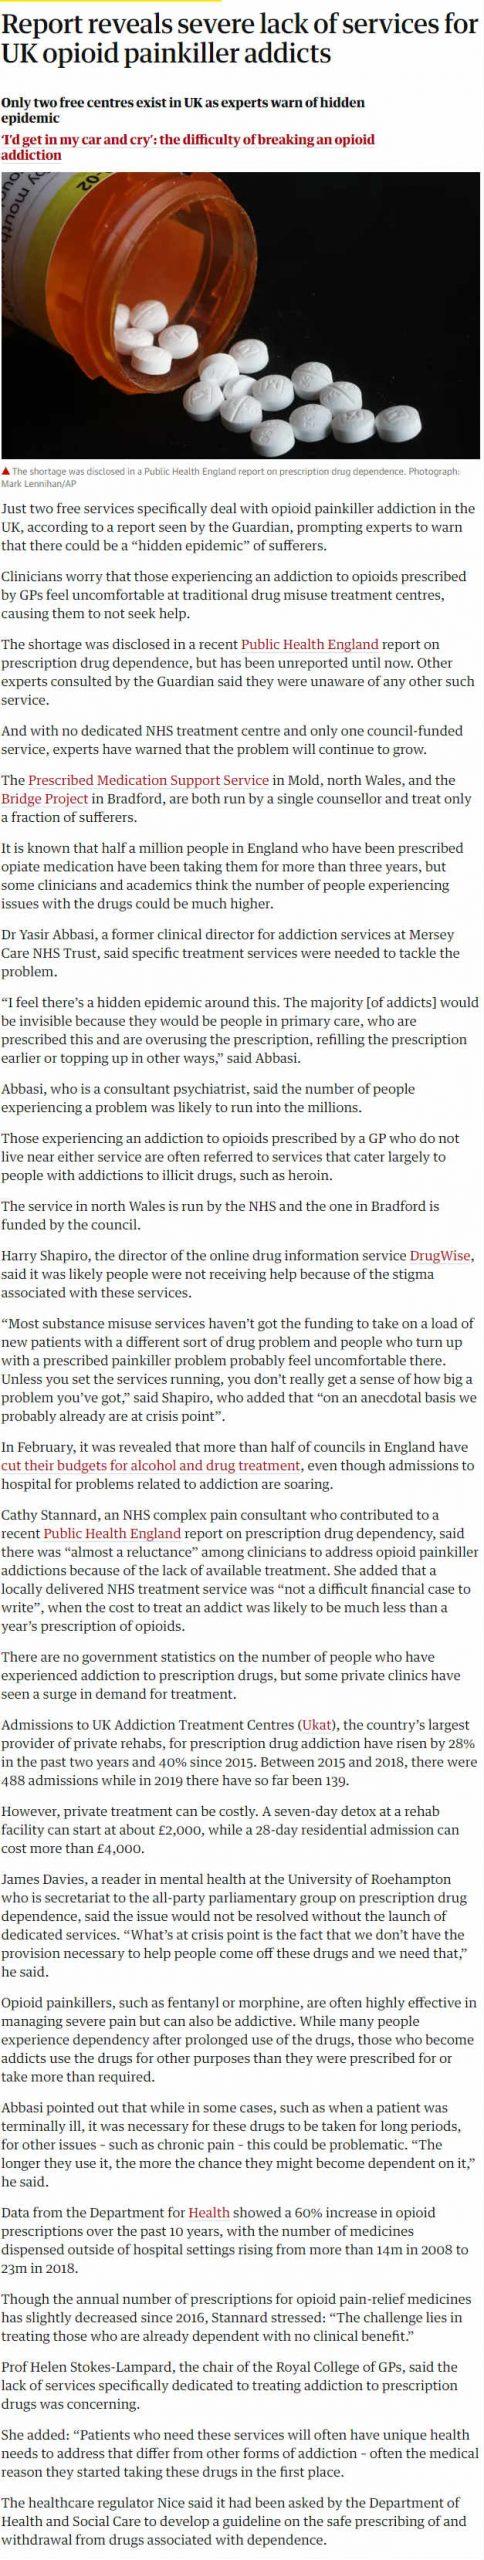 The Guardian - UKAT Records 28 per cent Rise in Prescription Addiction Admissions